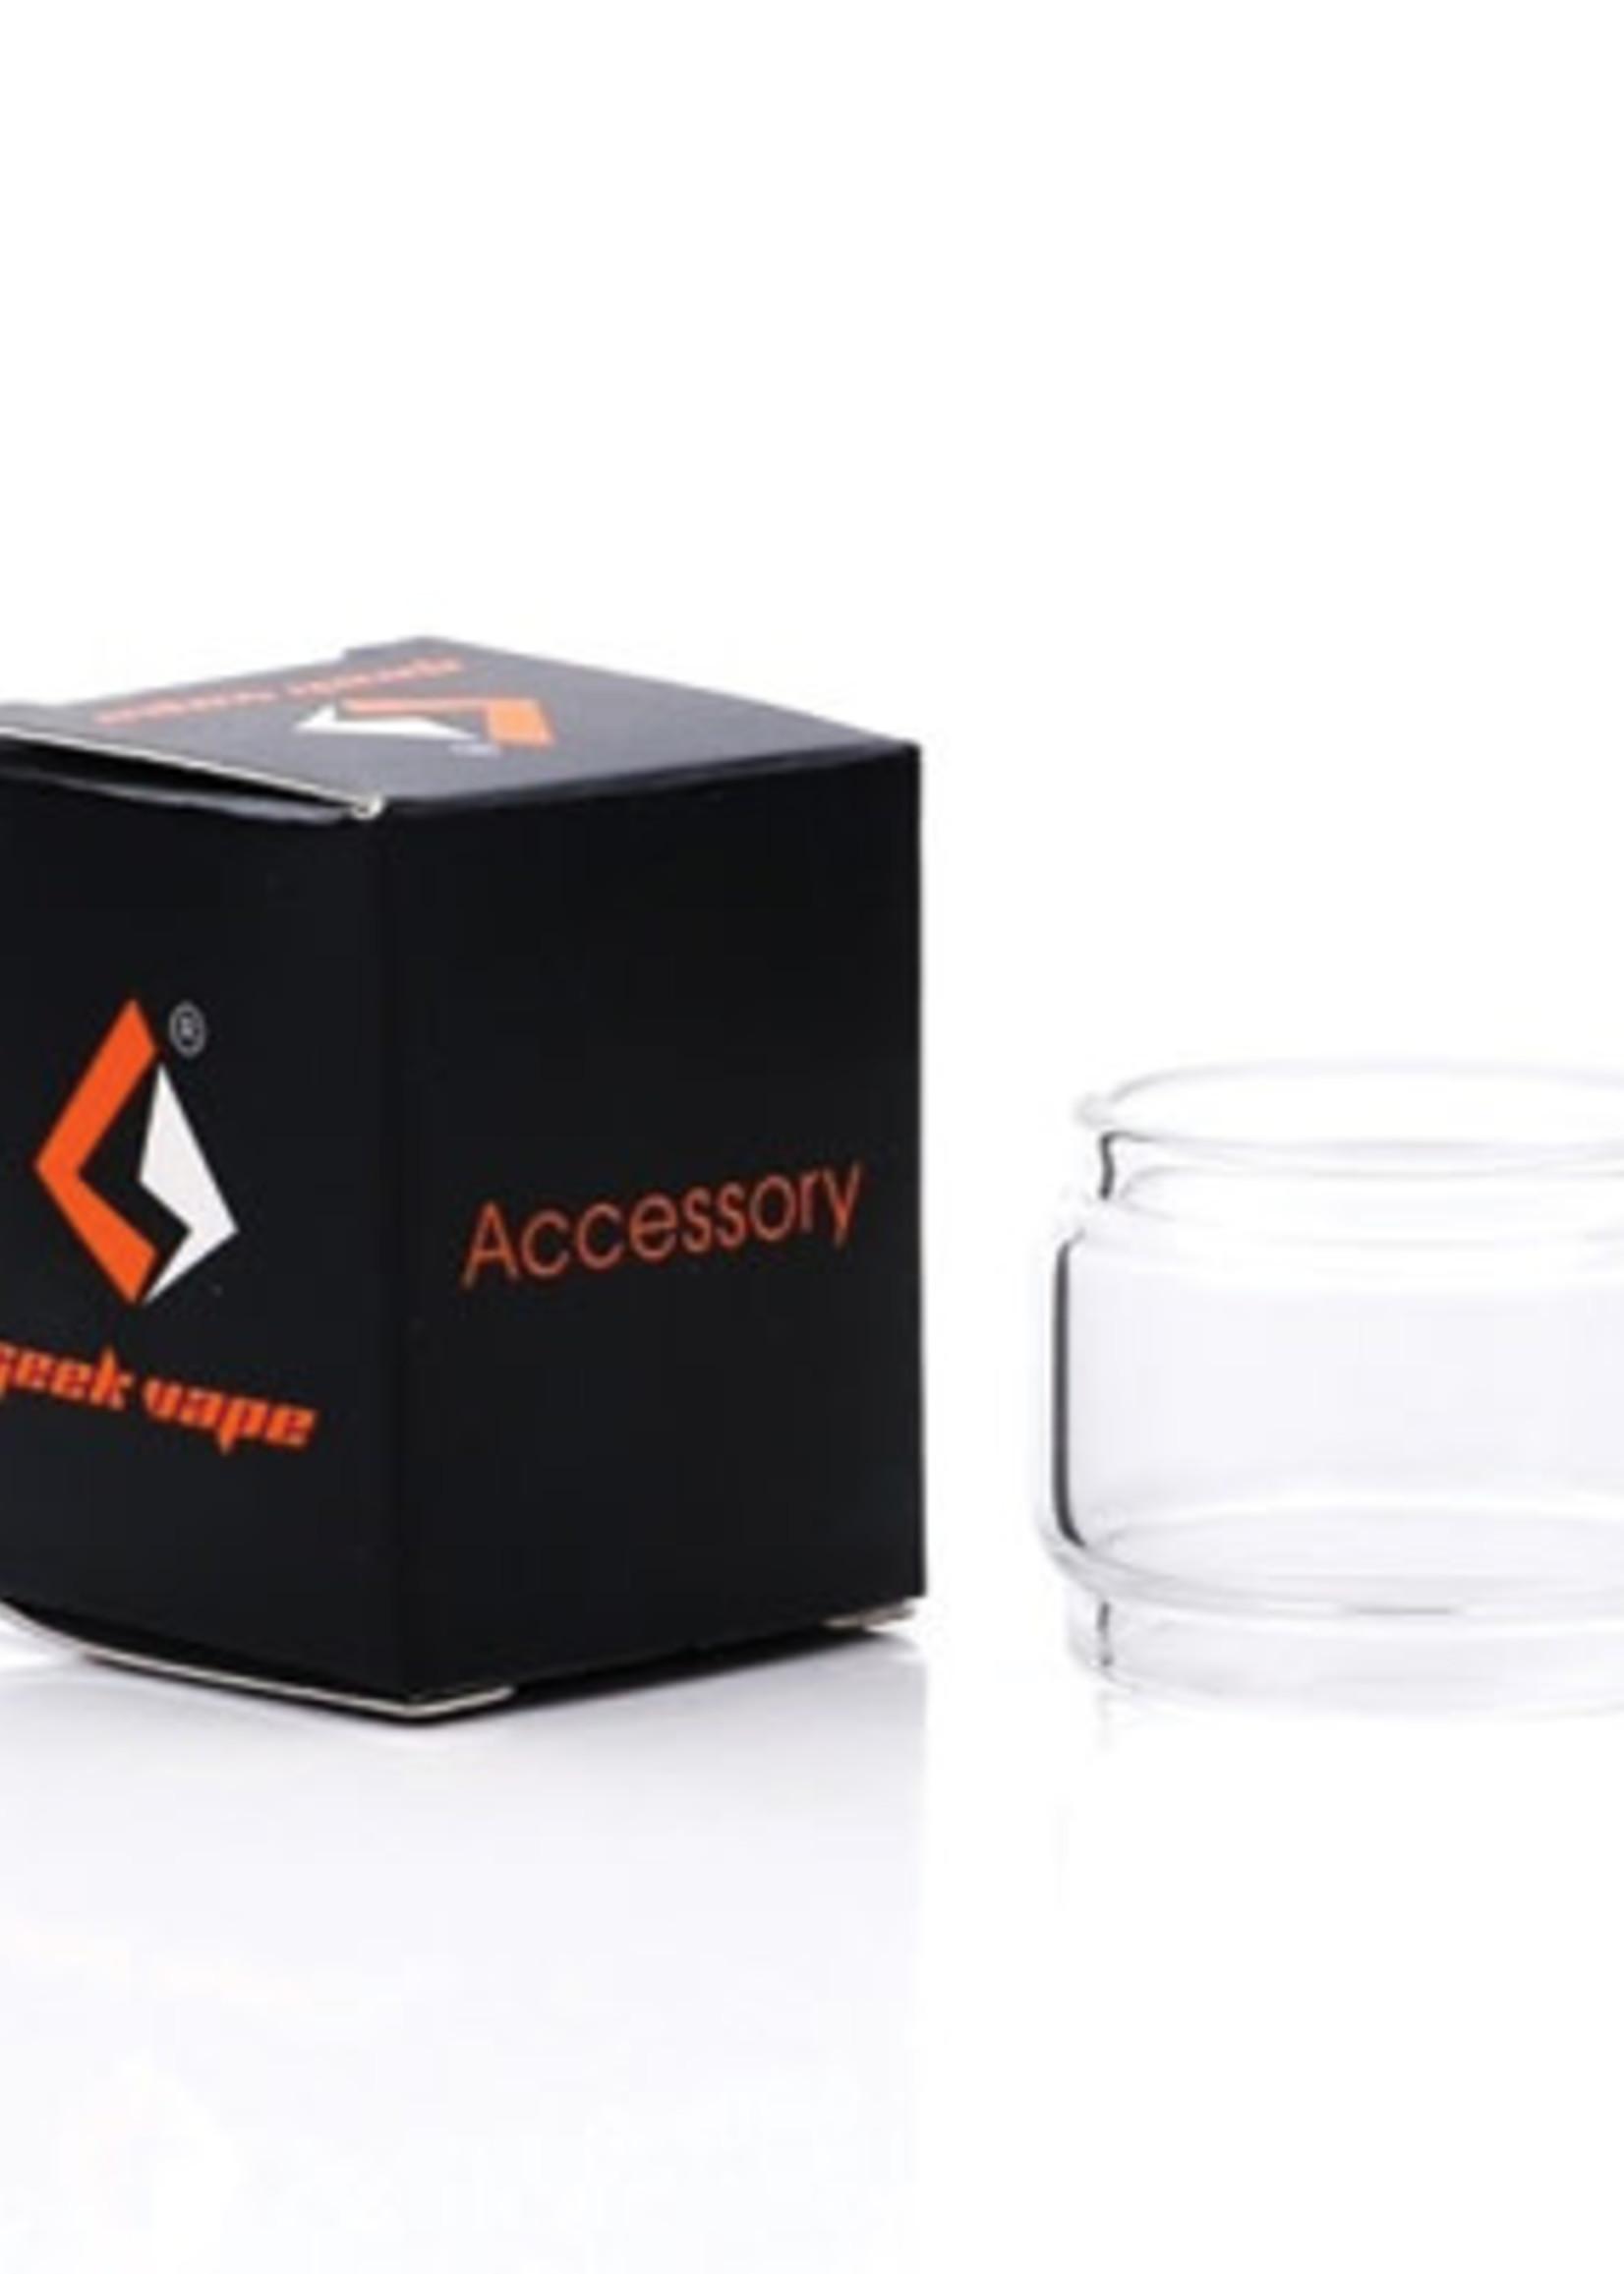 Geekvape Aegis solo cerberus - Bubble glass tube